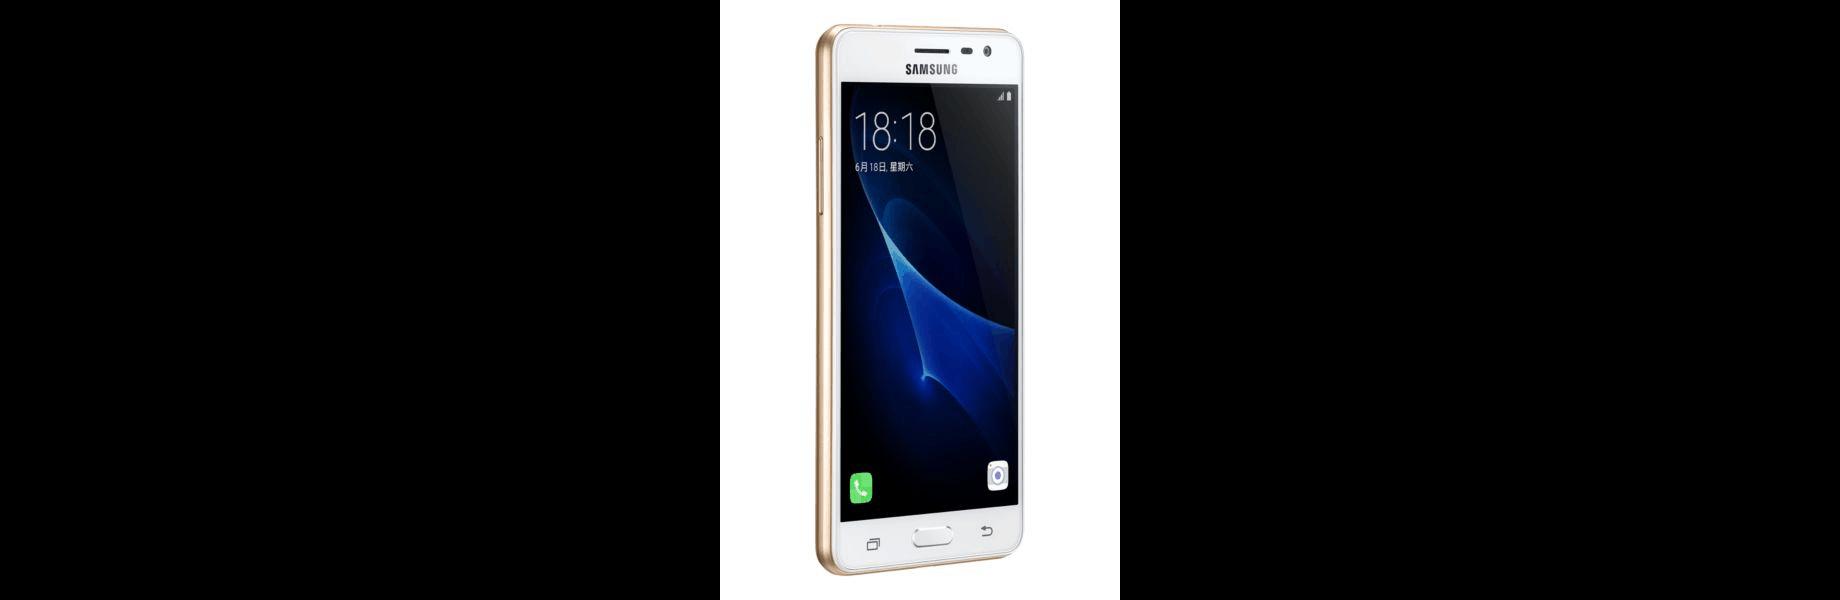 Samsung Galaxy J3 Pro 13